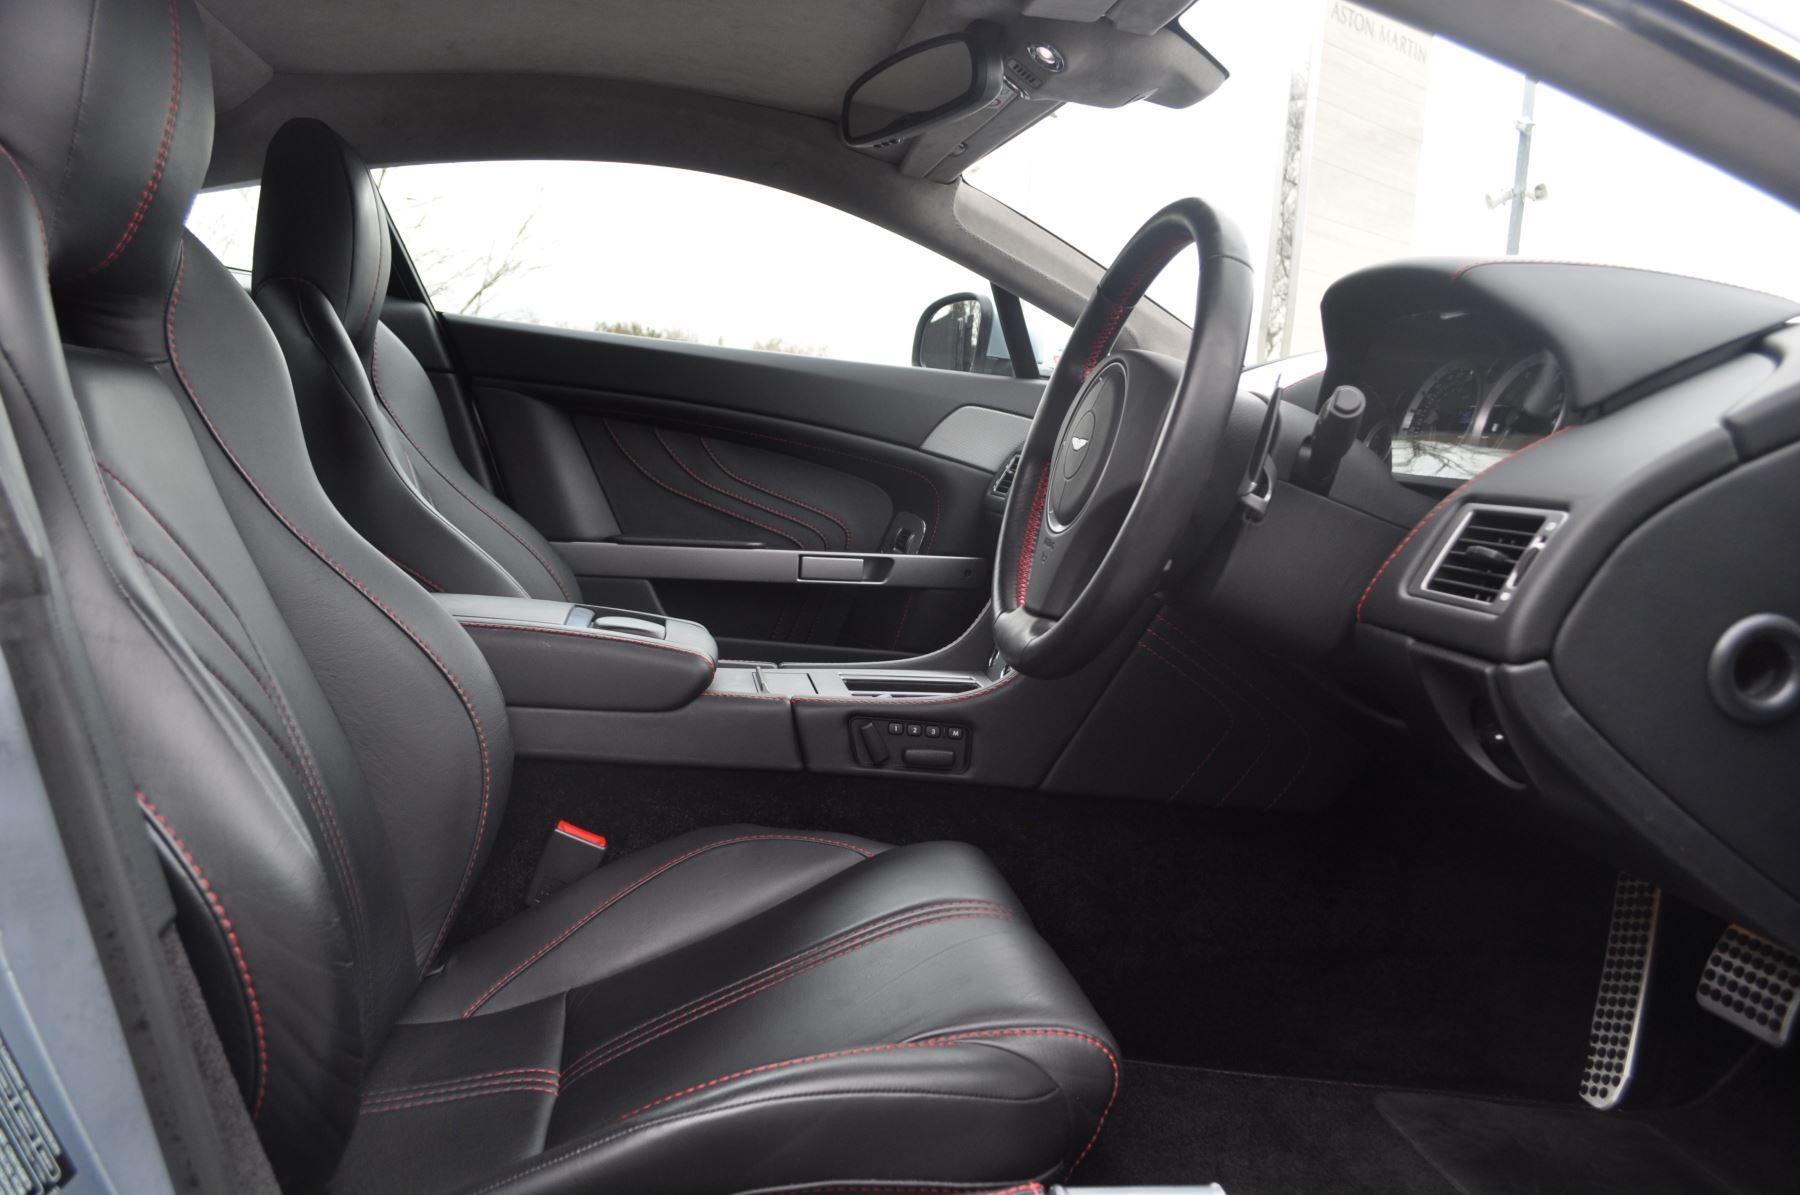 Aston Martin V8 Vantage S Coupe Coupe image 22